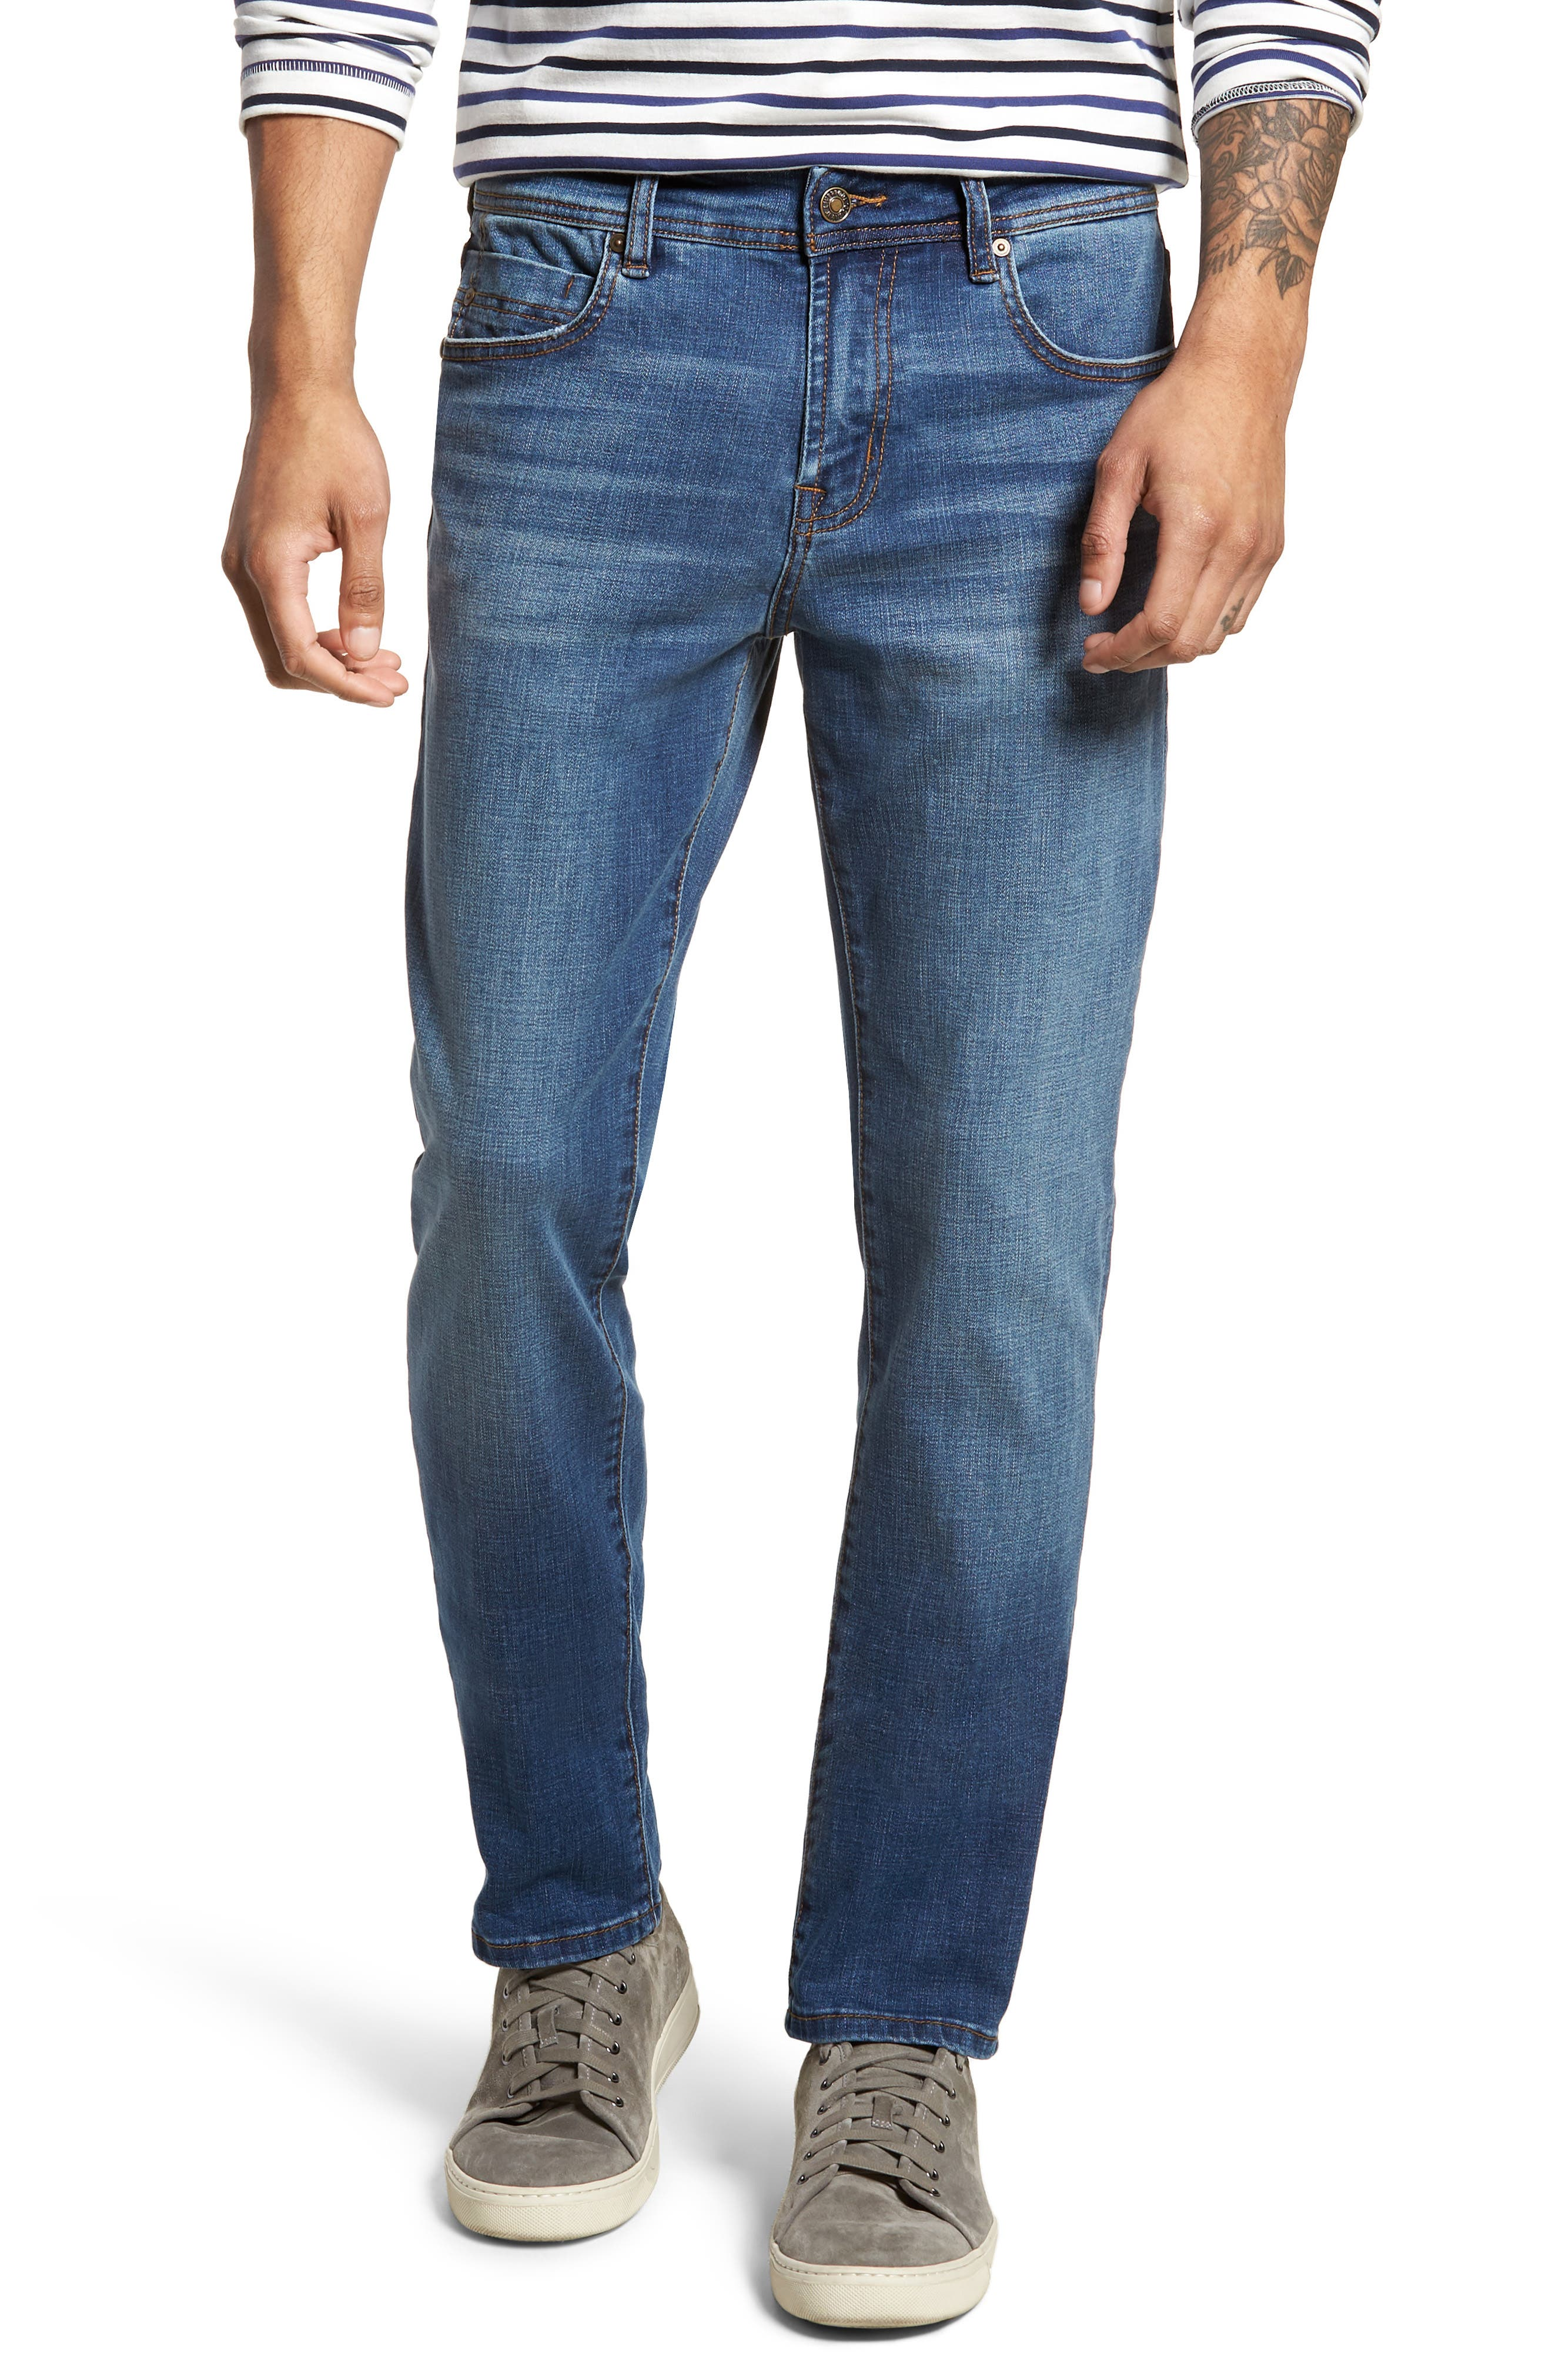 Jeans Co. Kingston Slim Straight Leg Jeans,                         Main,                         color, HIGHLANDER MID